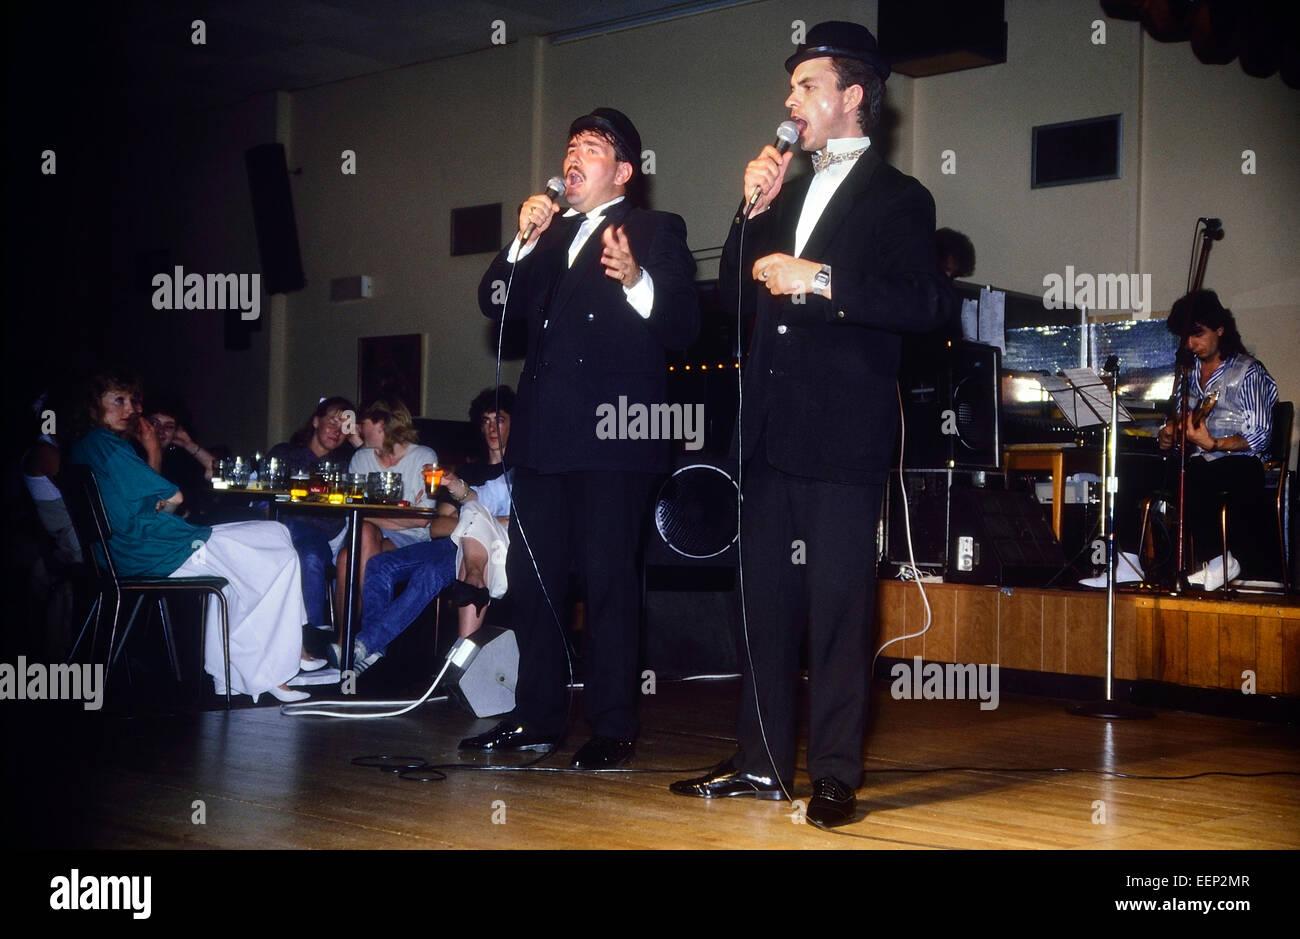 Cabaret entertainment at a Pontins Holiday Camp. Circa 1987. UK - Stock Image